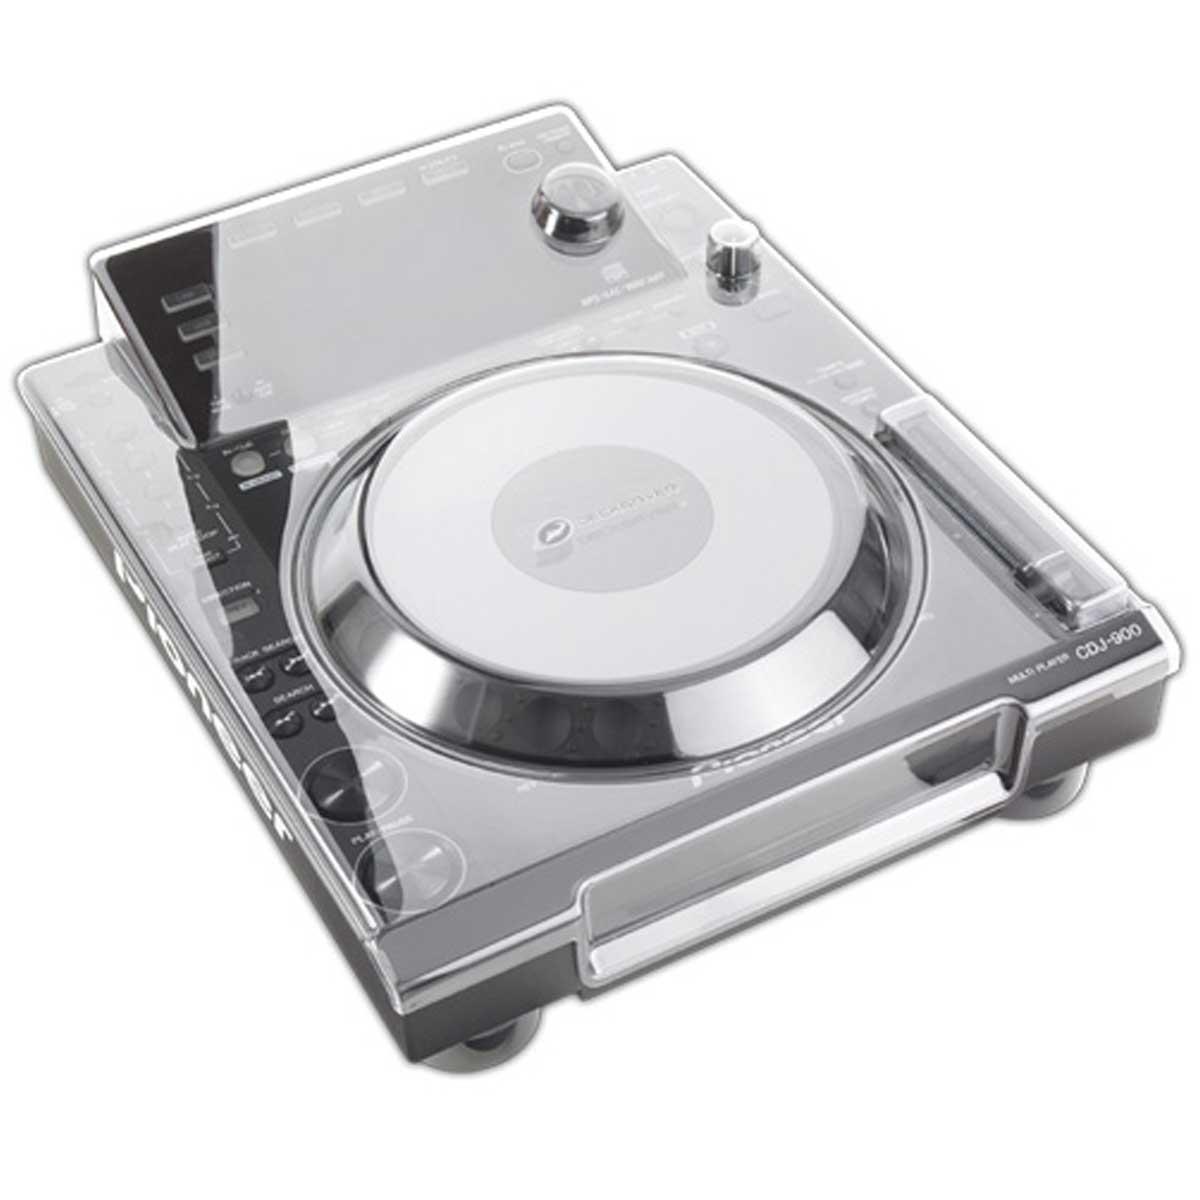 Decksaver デッキセーバー / DS-PC-CDJ900 CDJ-900用保護カバー【お取り寄せ商品】